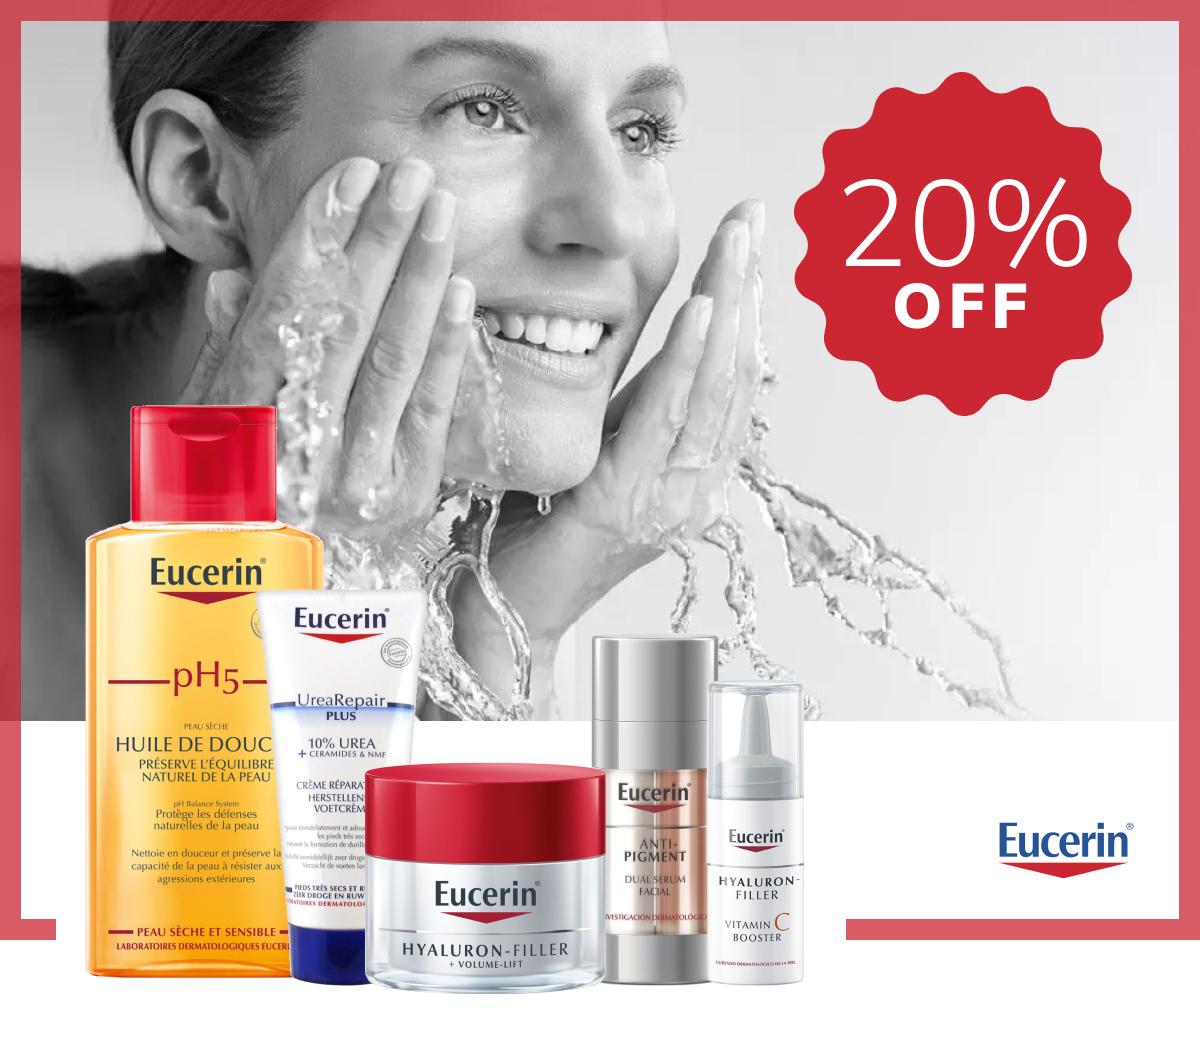 Eucerin Facial Care